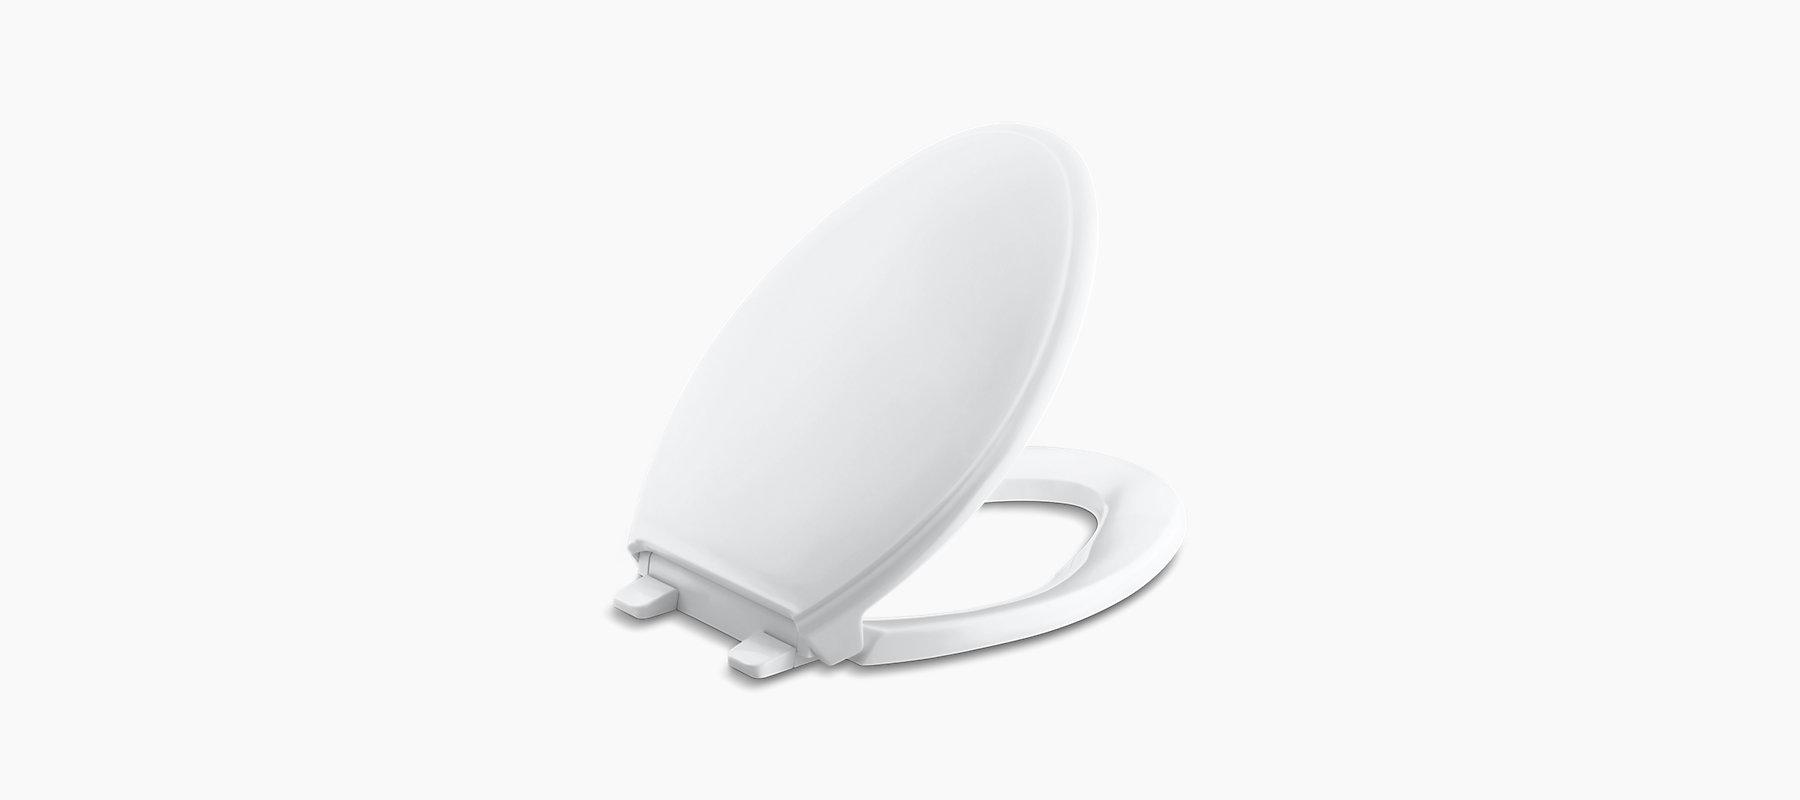 K 4684 Glenbury Elongated Toilet Seat With Quick Release